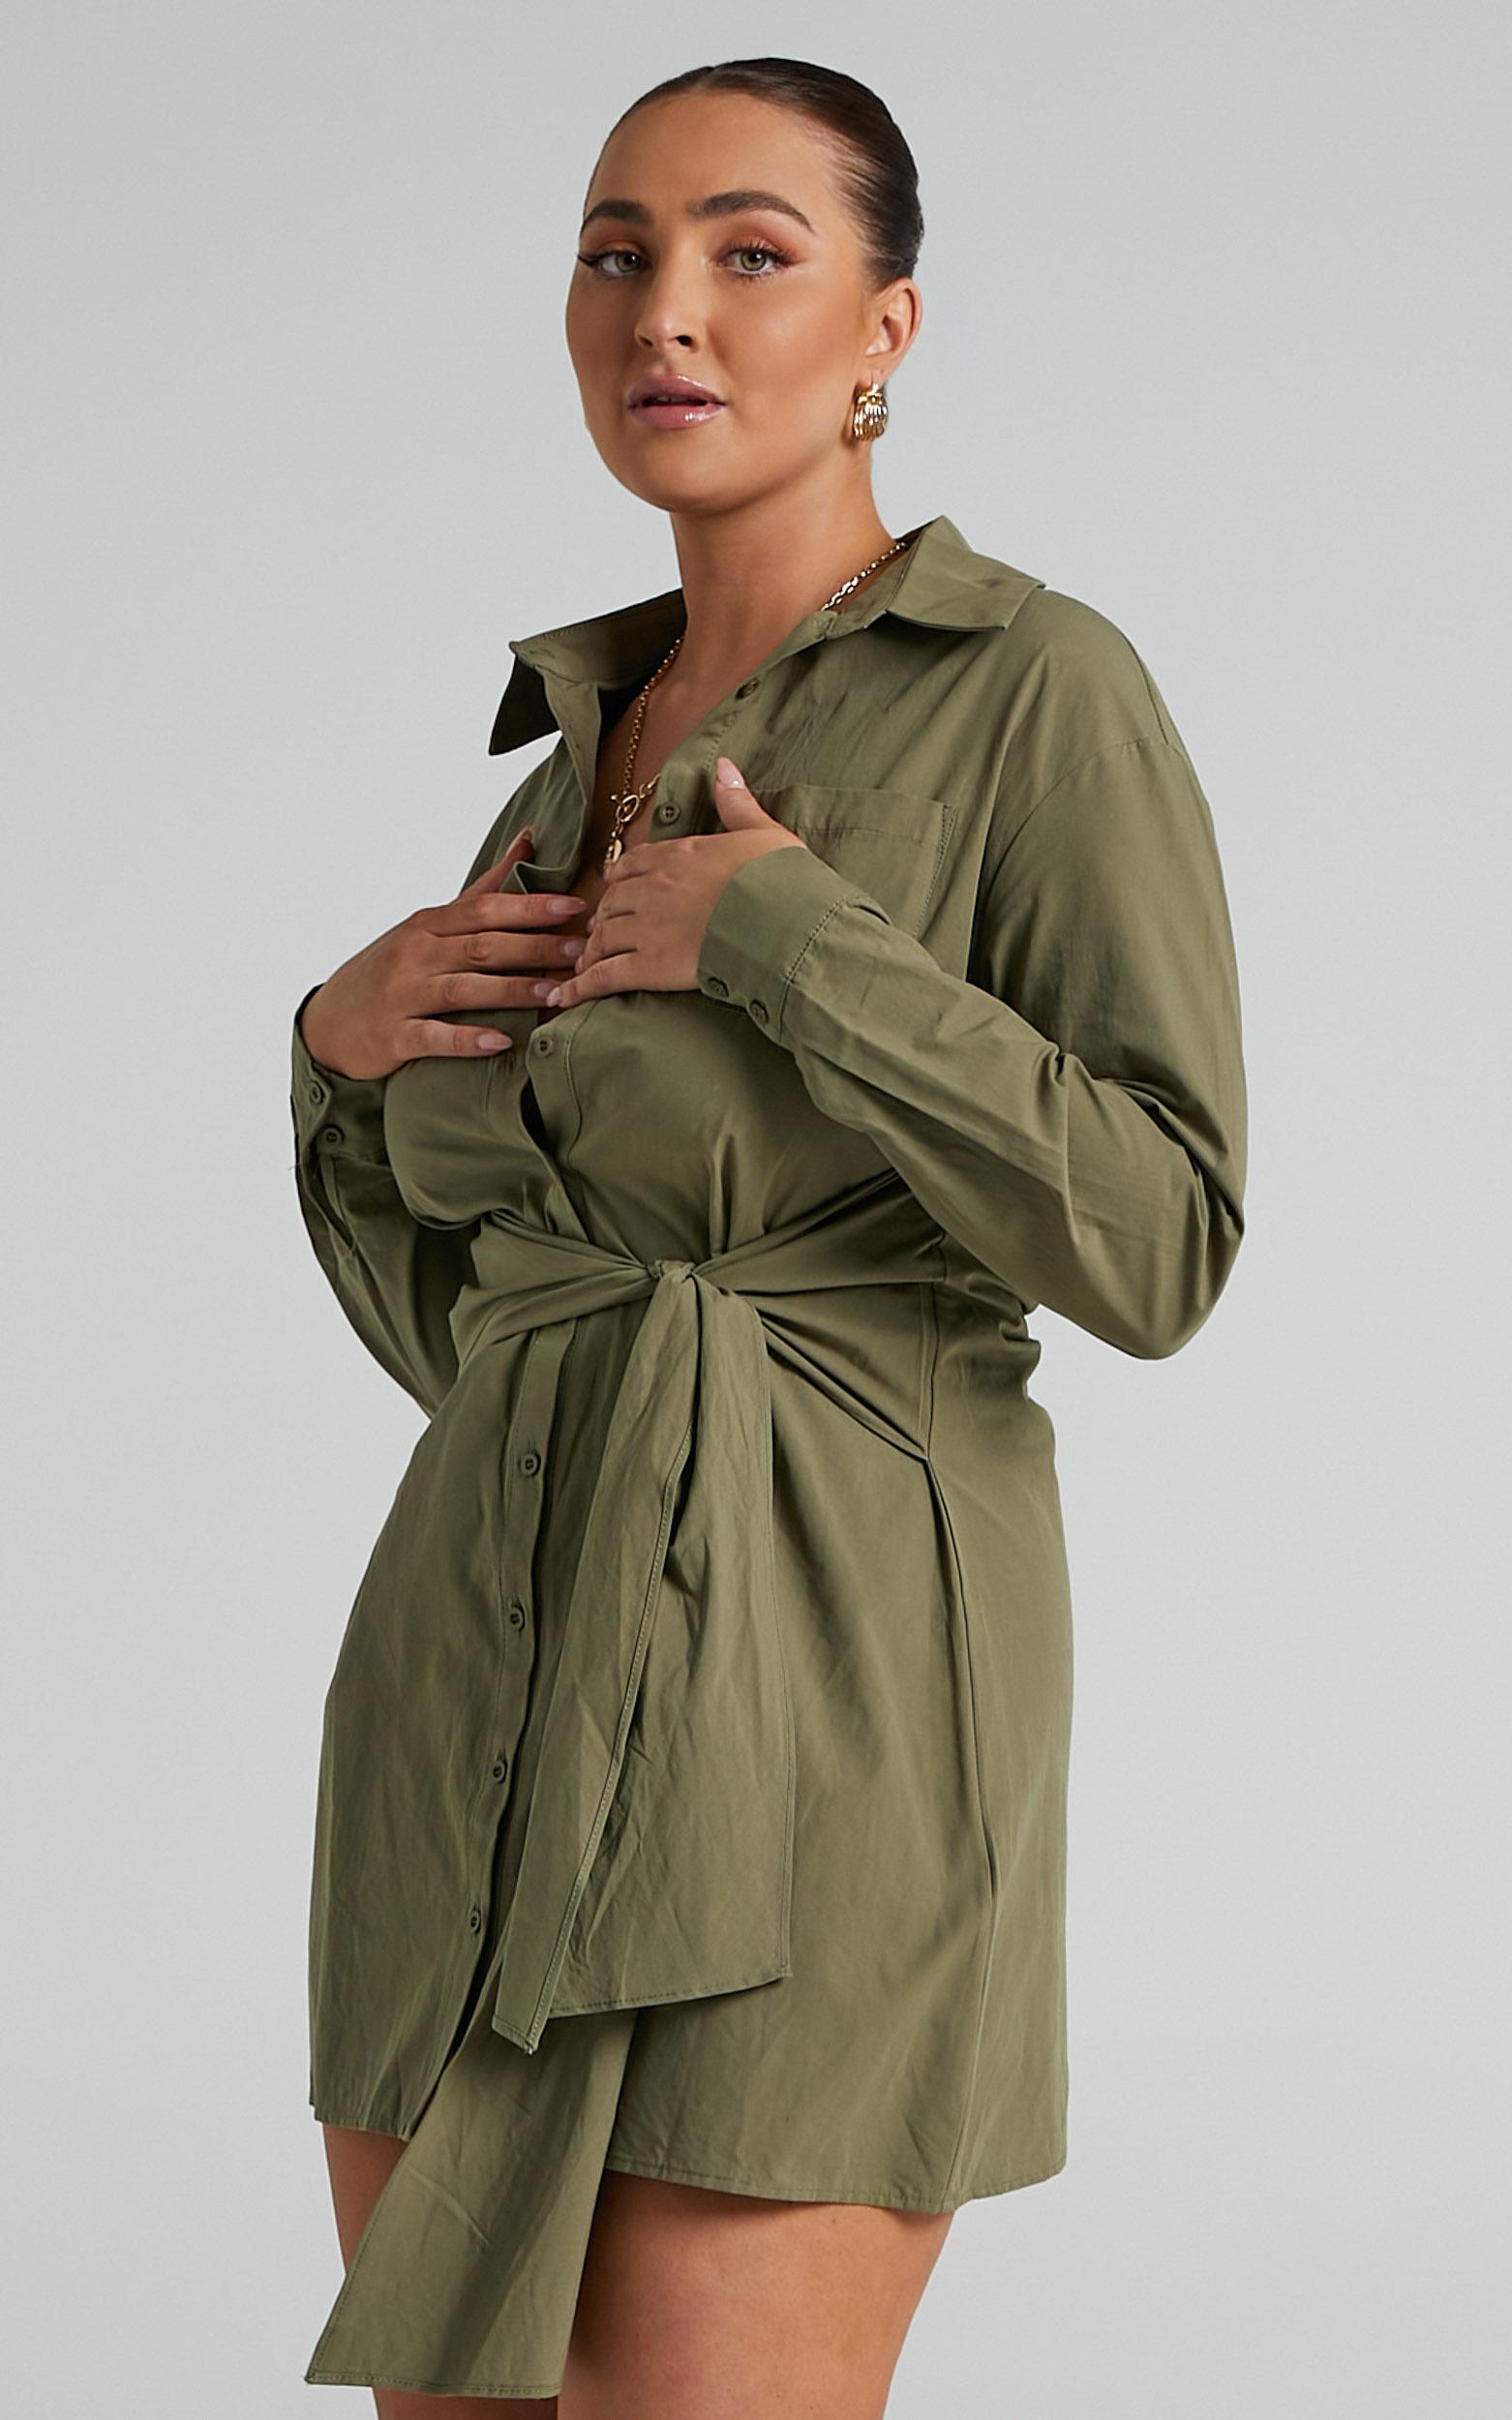 Macie Tie Front Shirt Mini Dress in Khaki - 04, GRN2, hi-res image number null